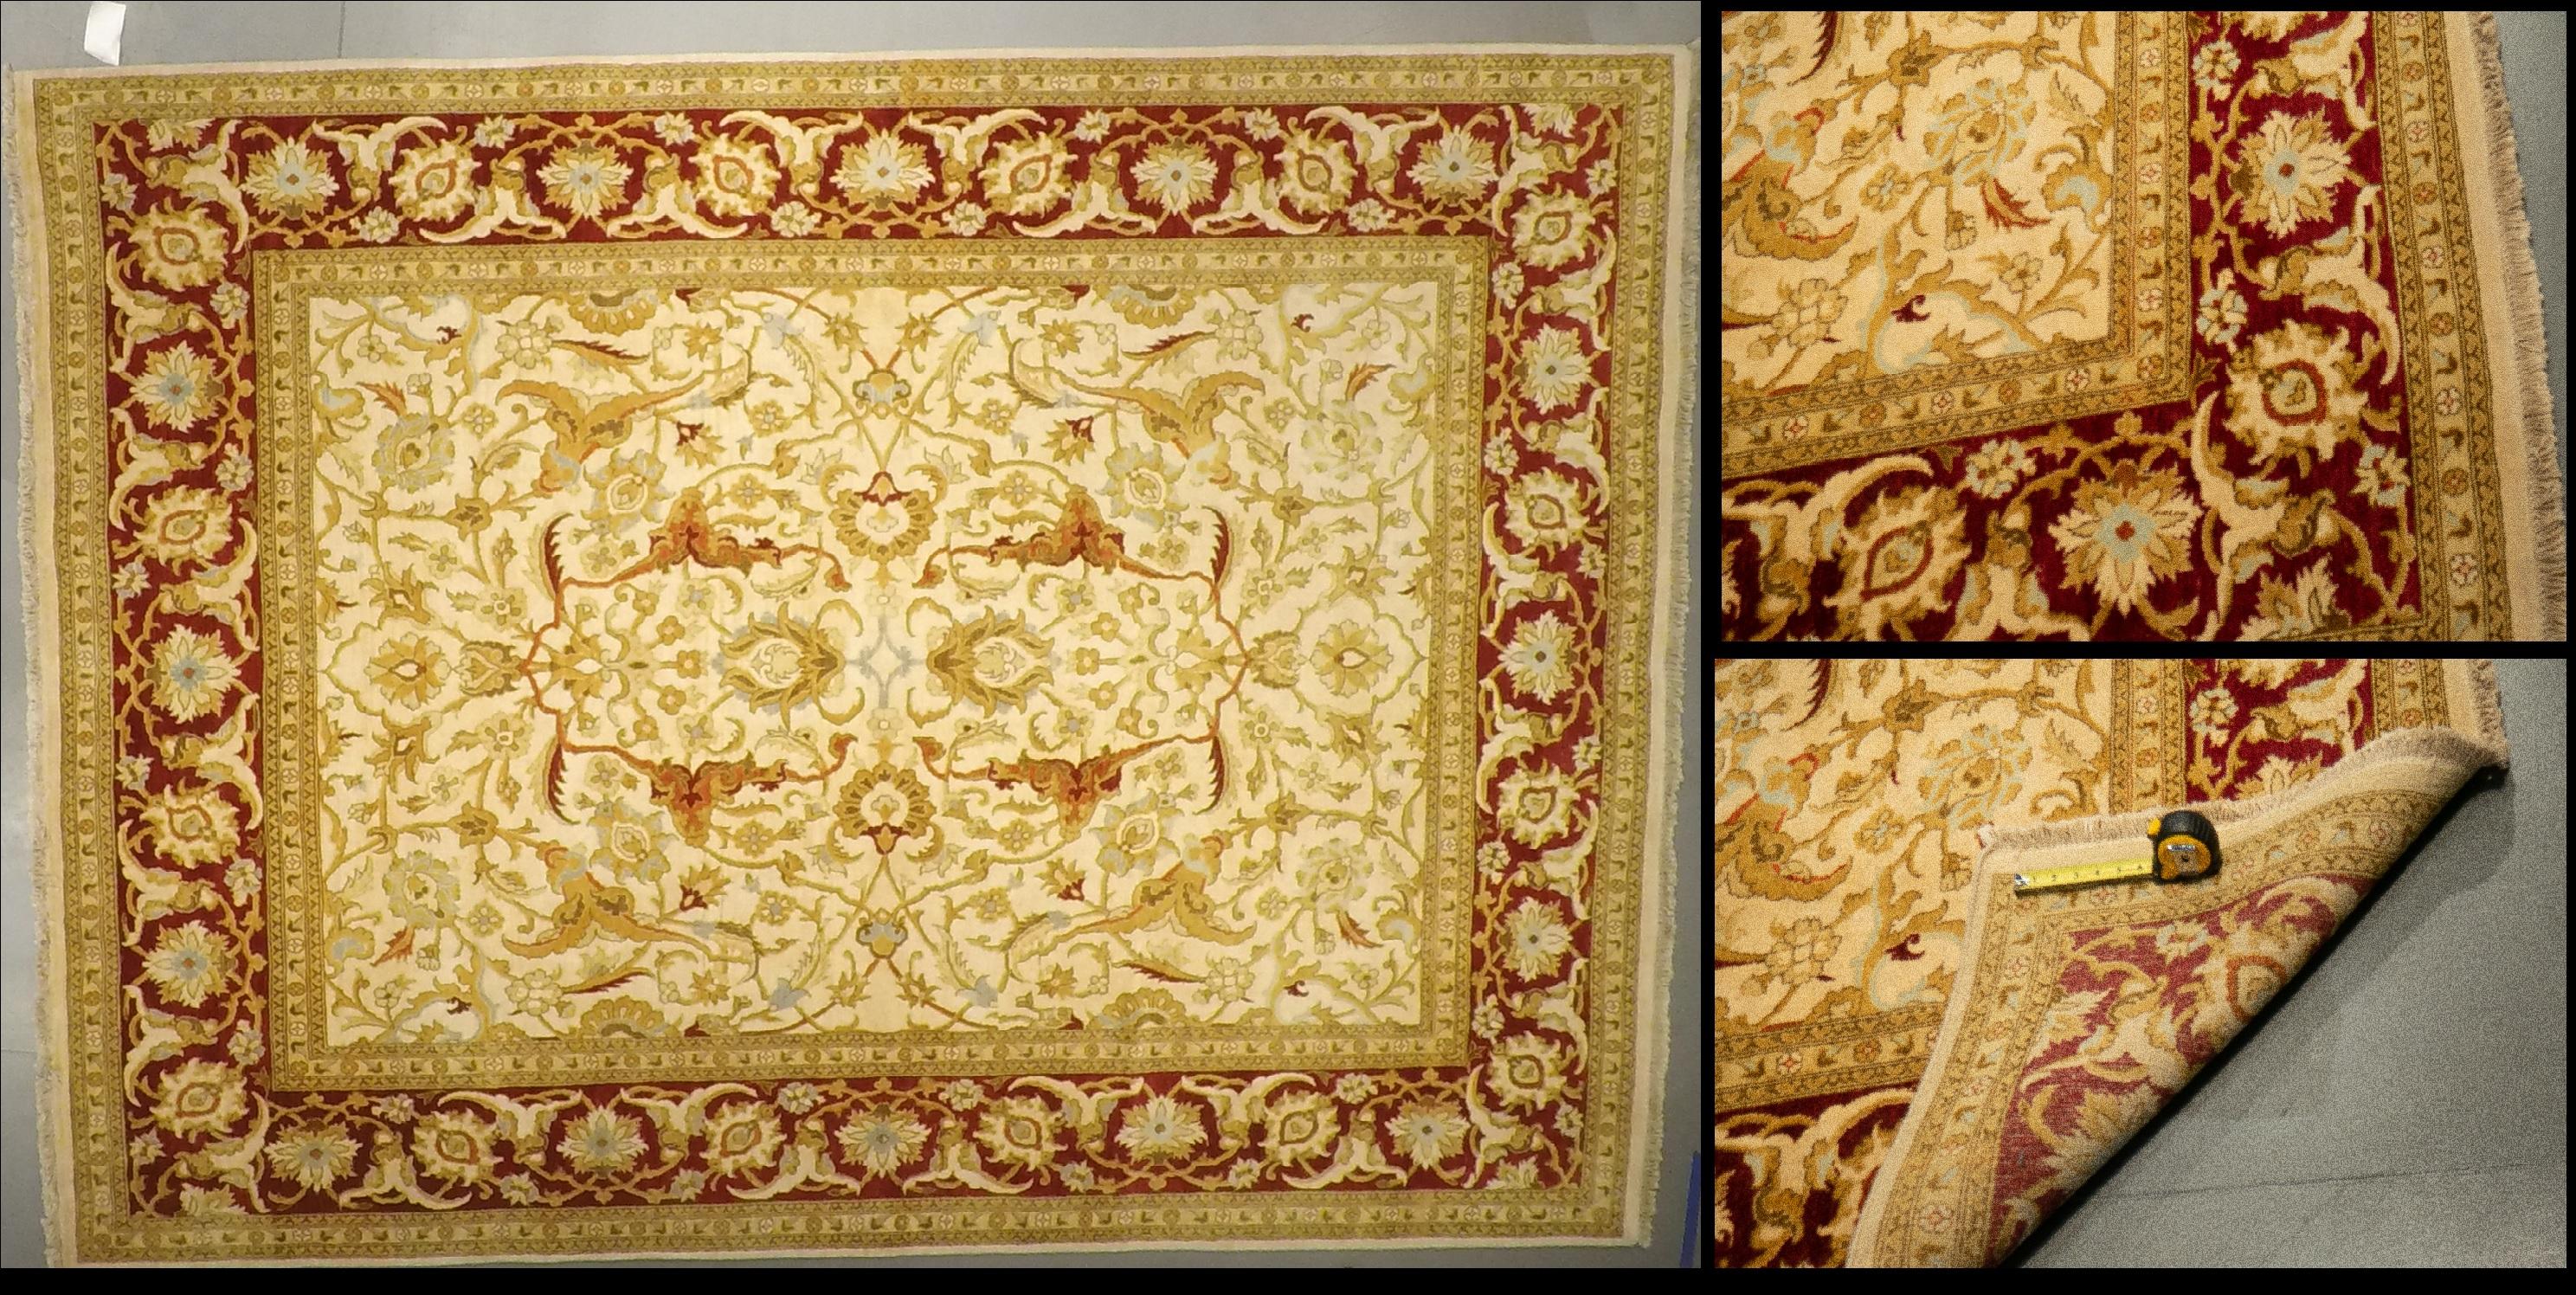 LD 66 3705 (7.10 x 10.3) Wool-Handma